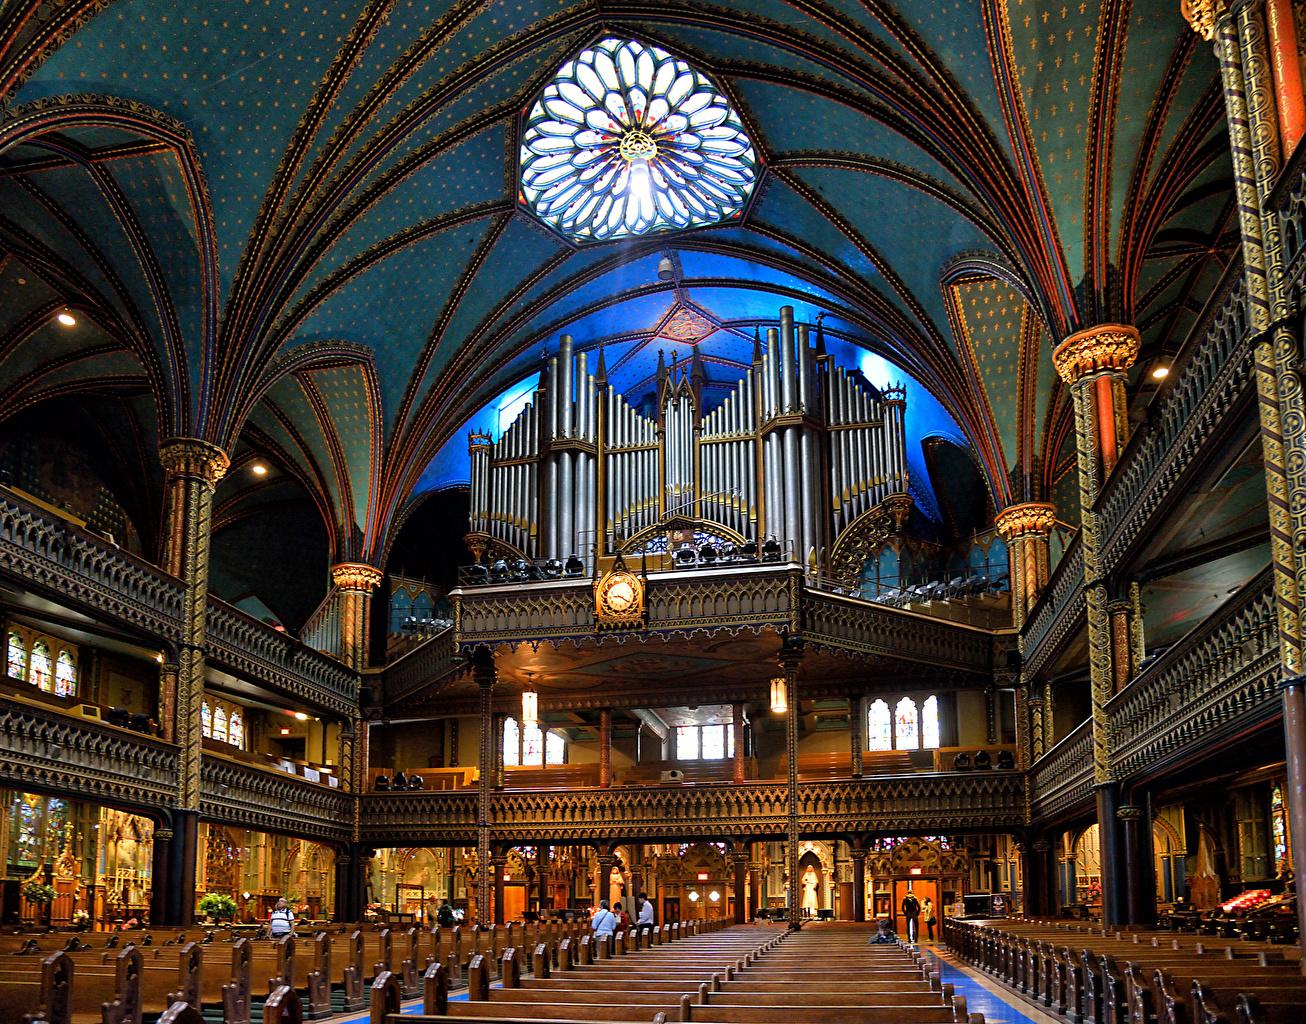 Обои для рабочего стола Канада Notre-Dame Basilica Montreal Интерьер храм город Храмы Города